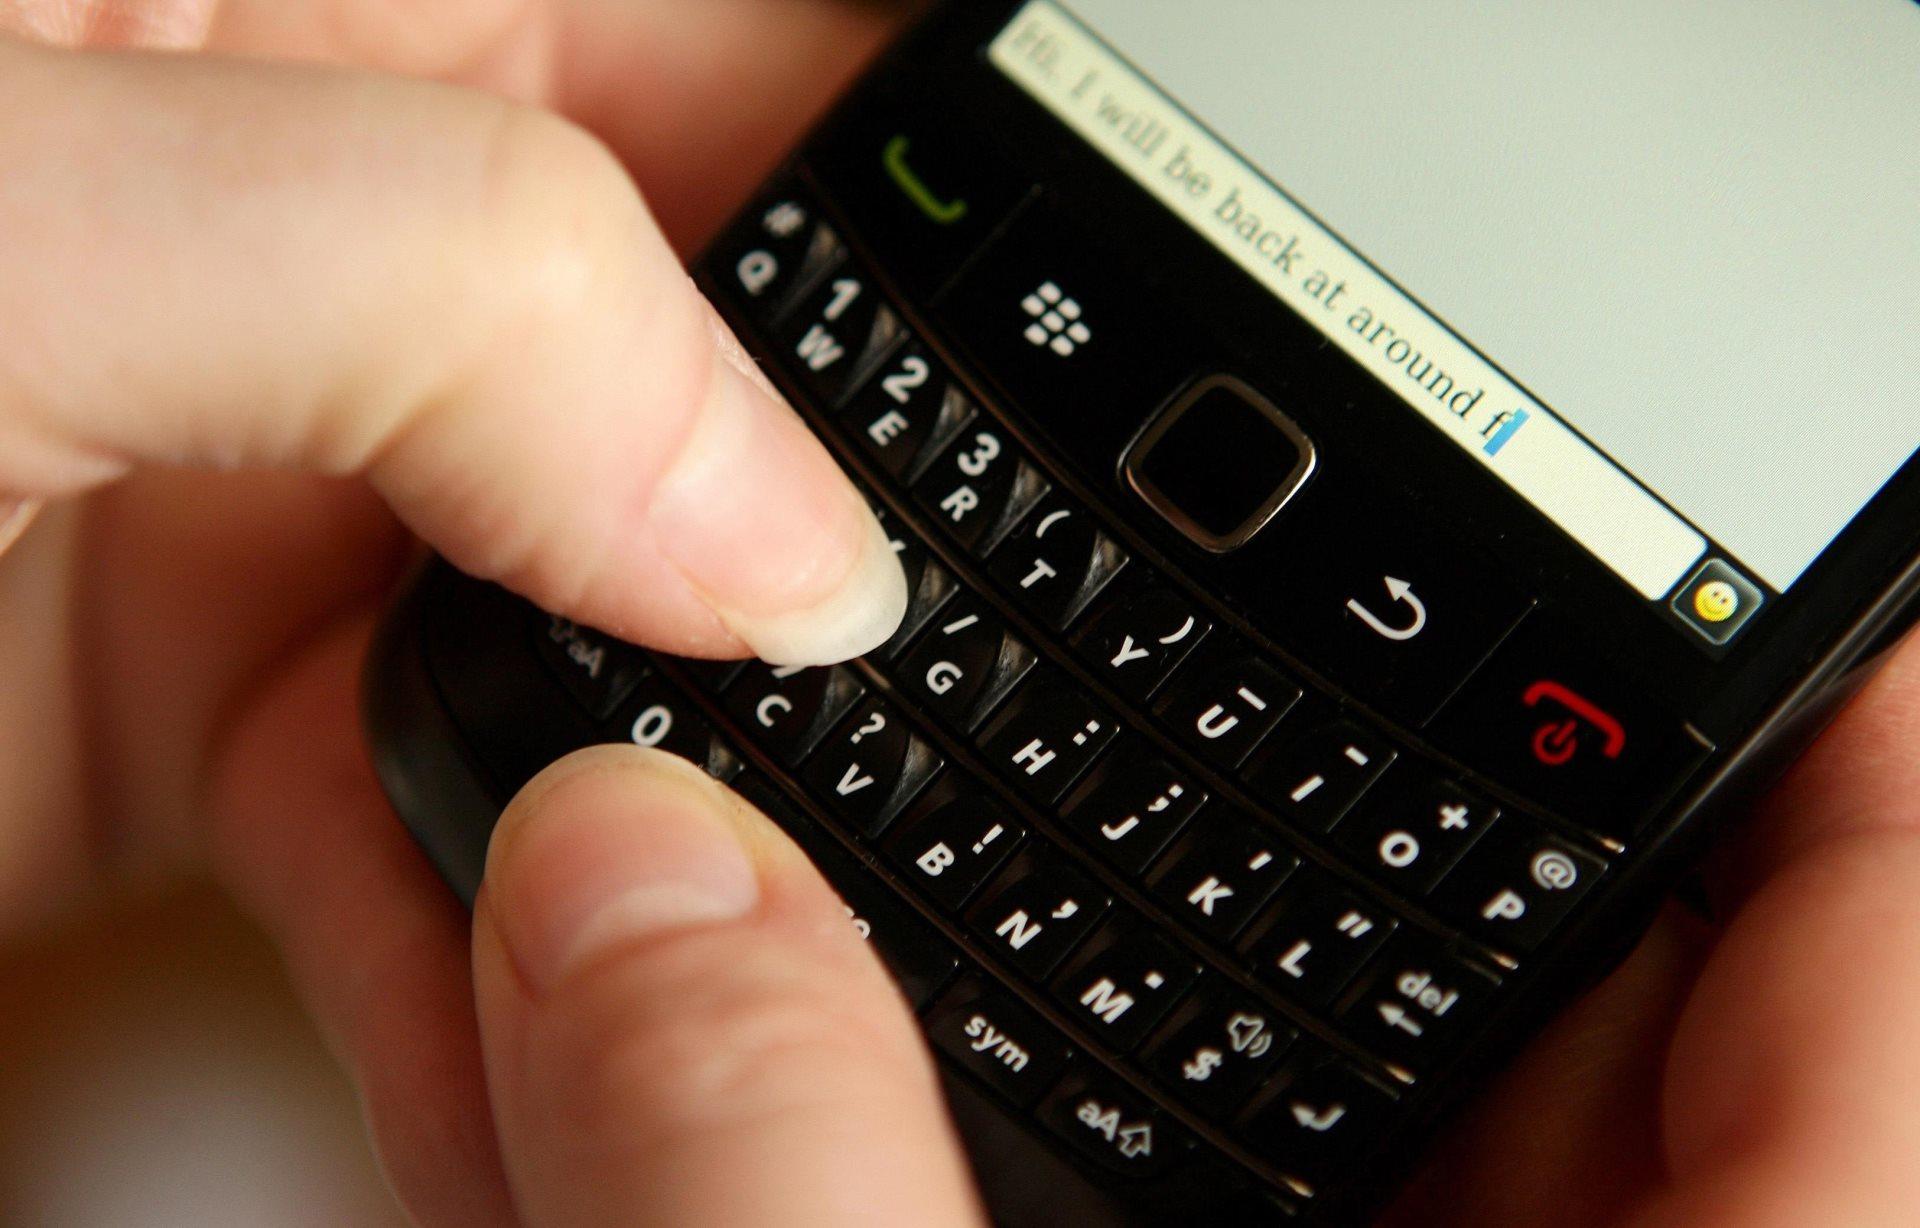 Cuando todos soñábamos con tener un BlackBerry